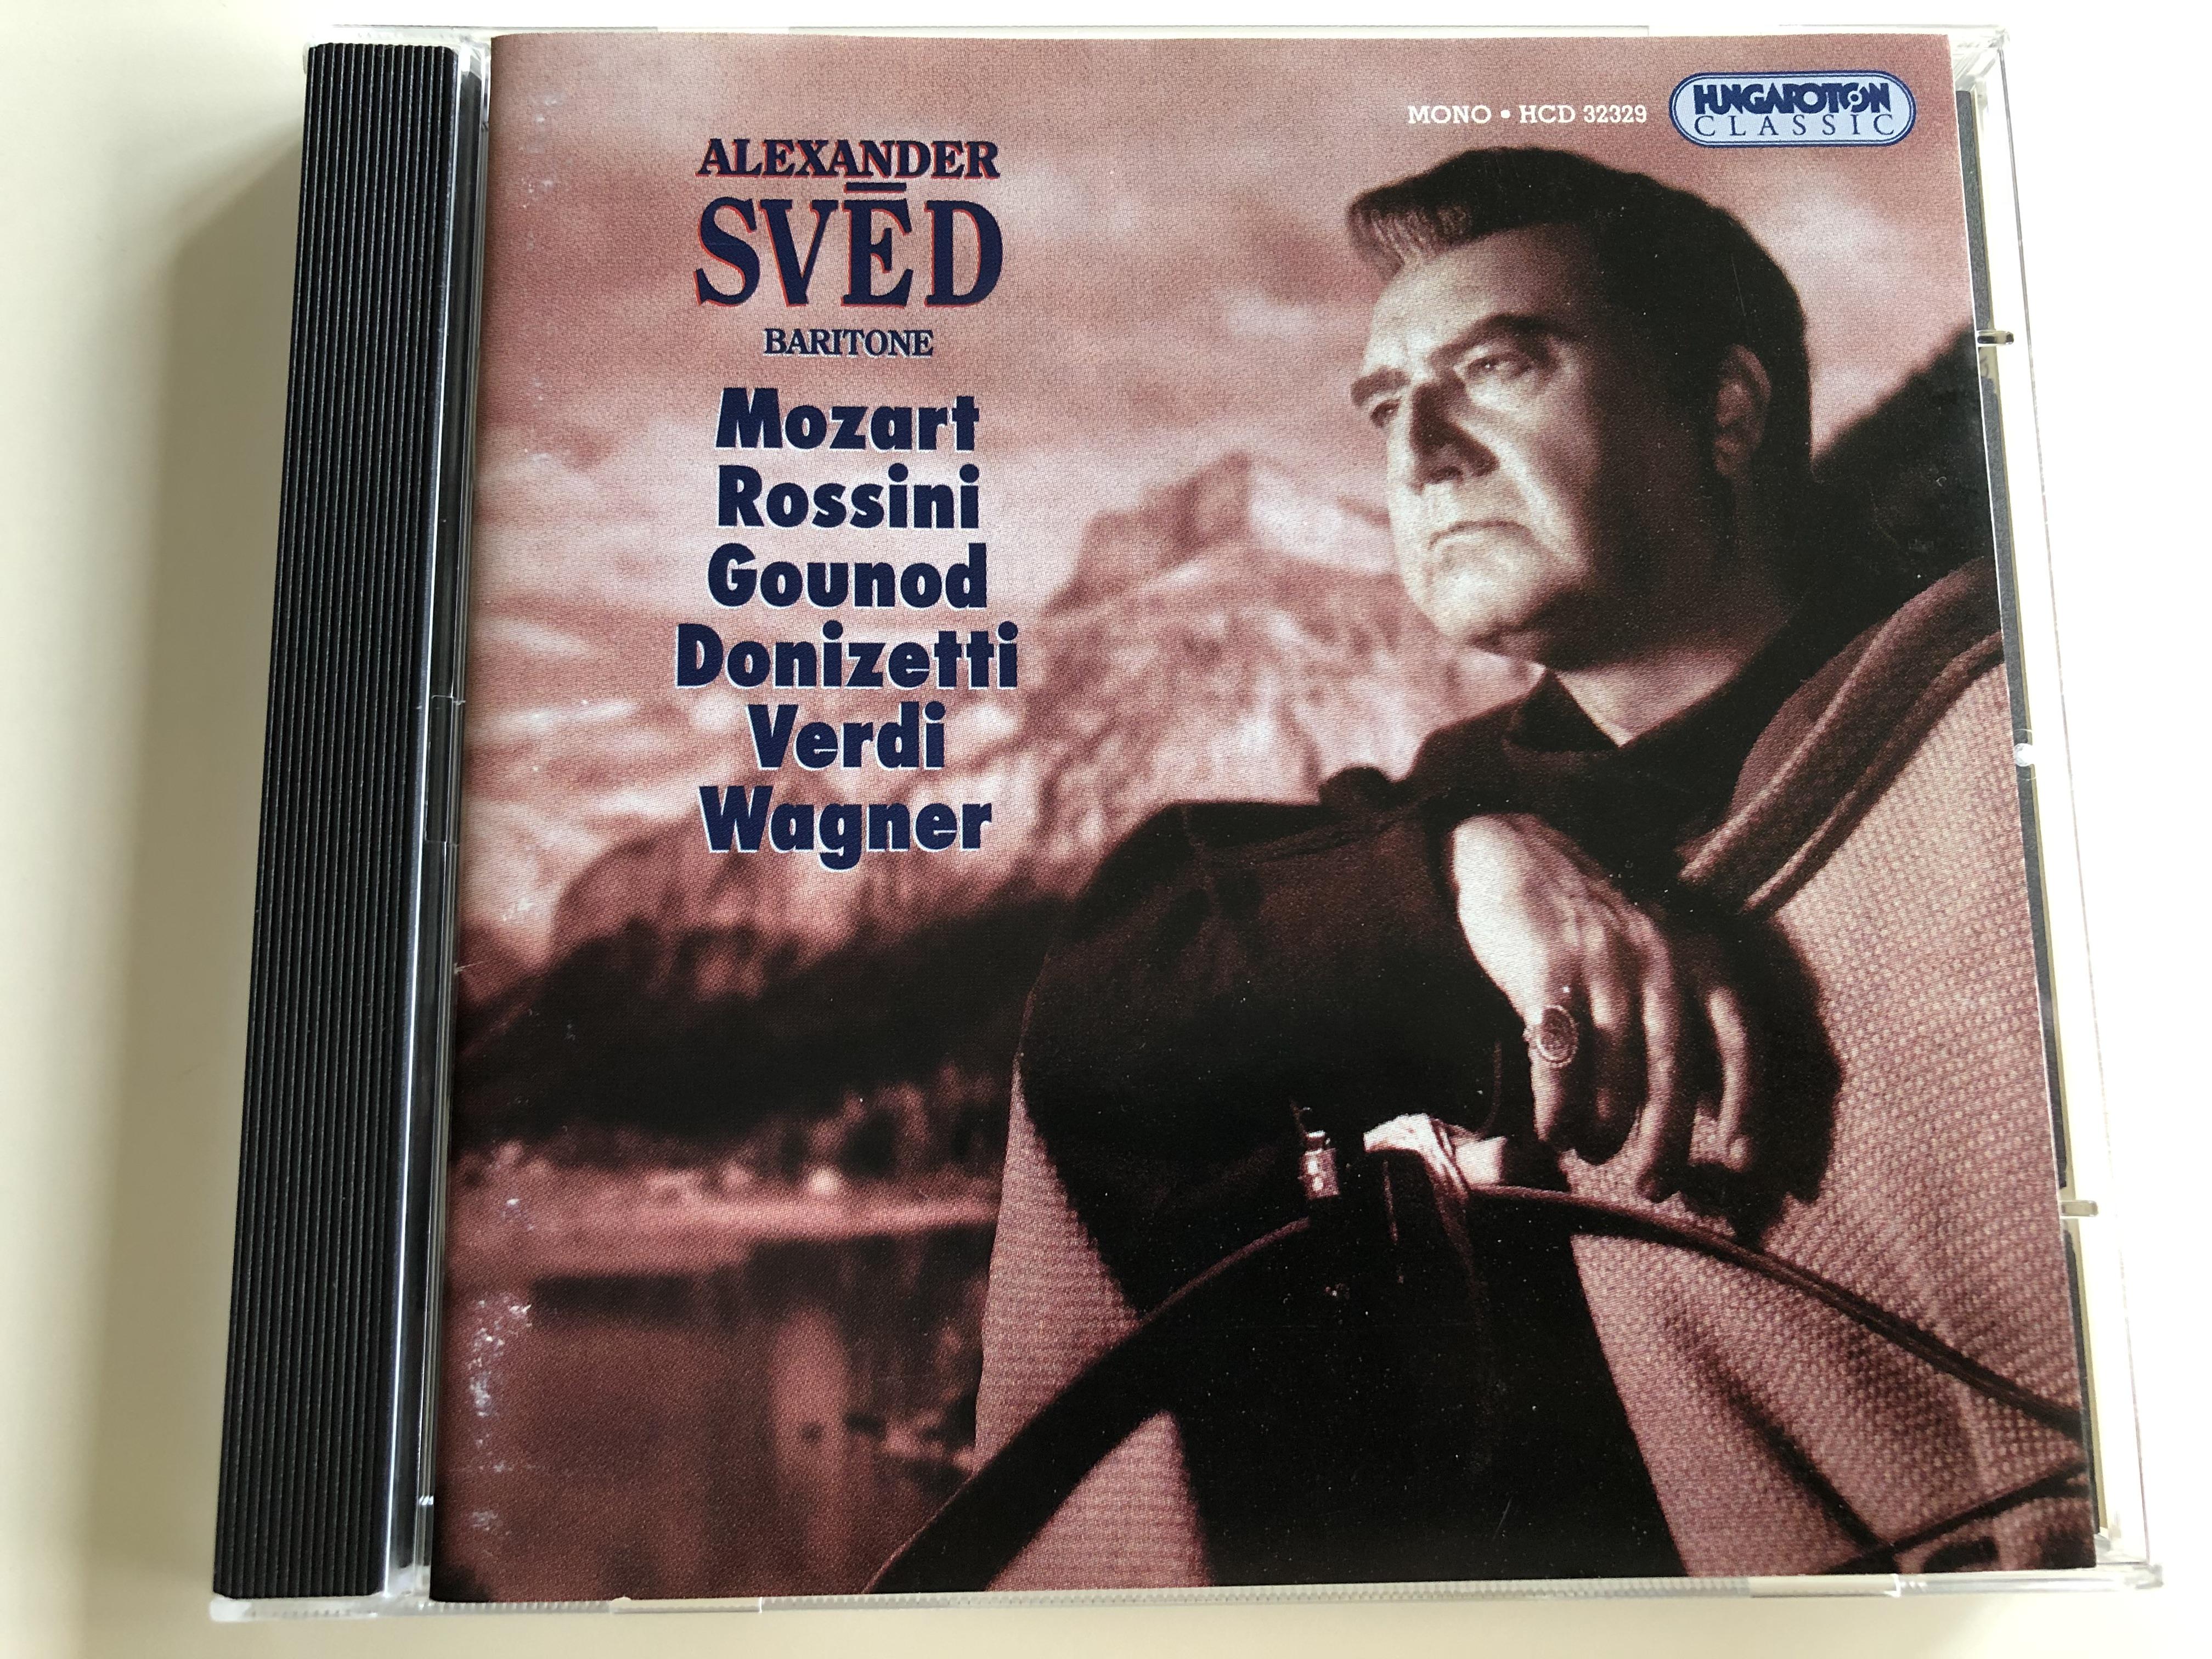 alexander-sv-d-baritone-audio-cd-2005-mozart-rossini-gounod-donizetti-verdi-wagner-hungarian-state-opera-orchestra-hungaroton-classic-hcd-32329-1-.jpg